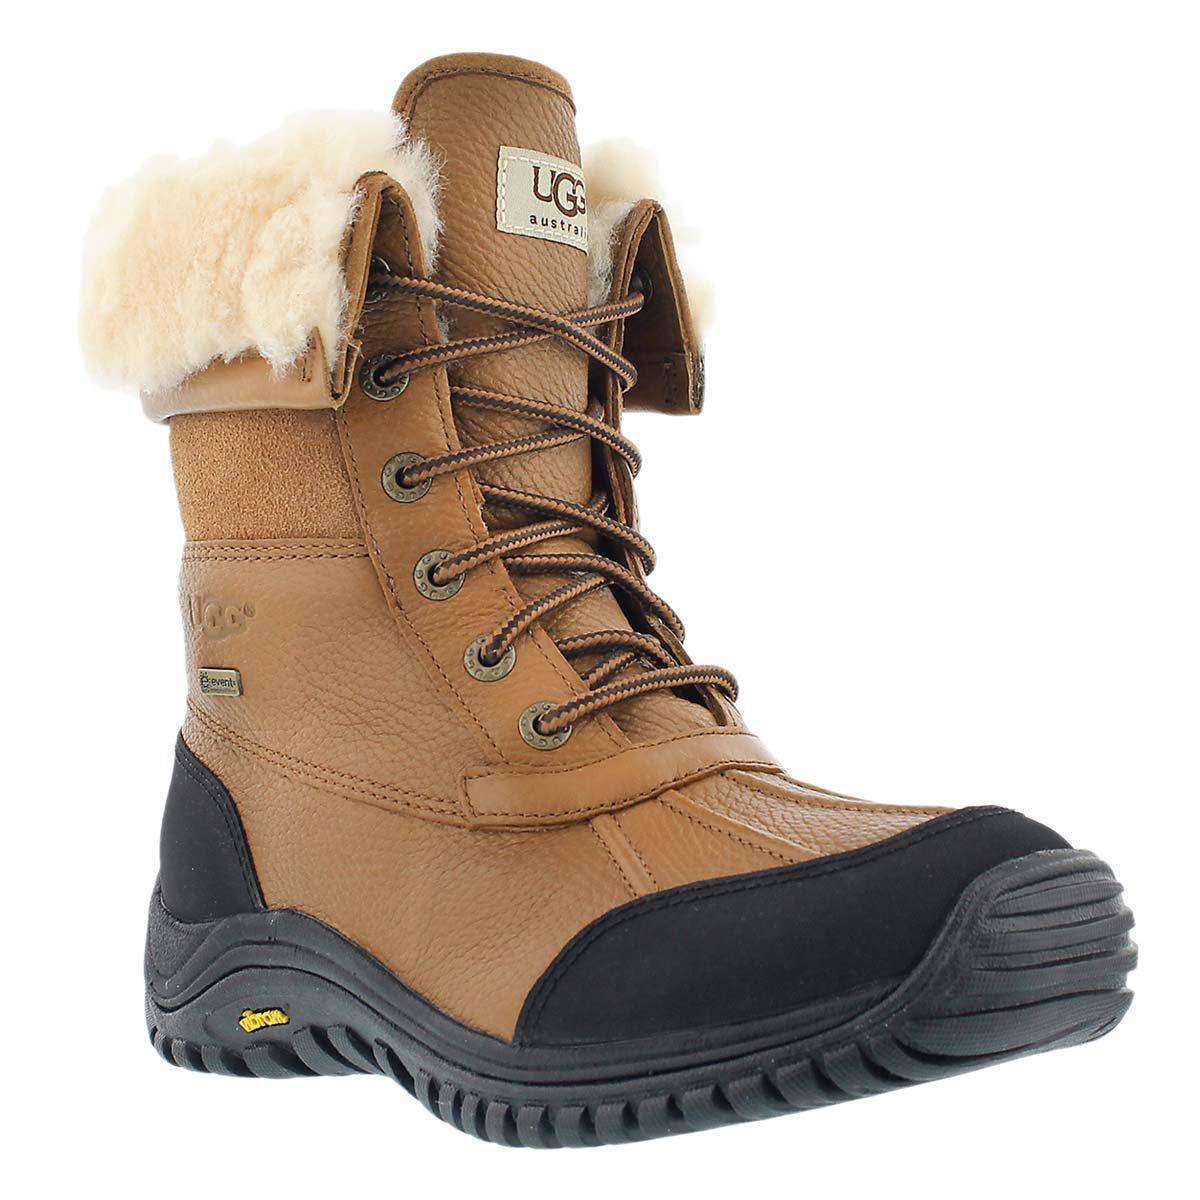 Lds Adirondack II otter winter boot